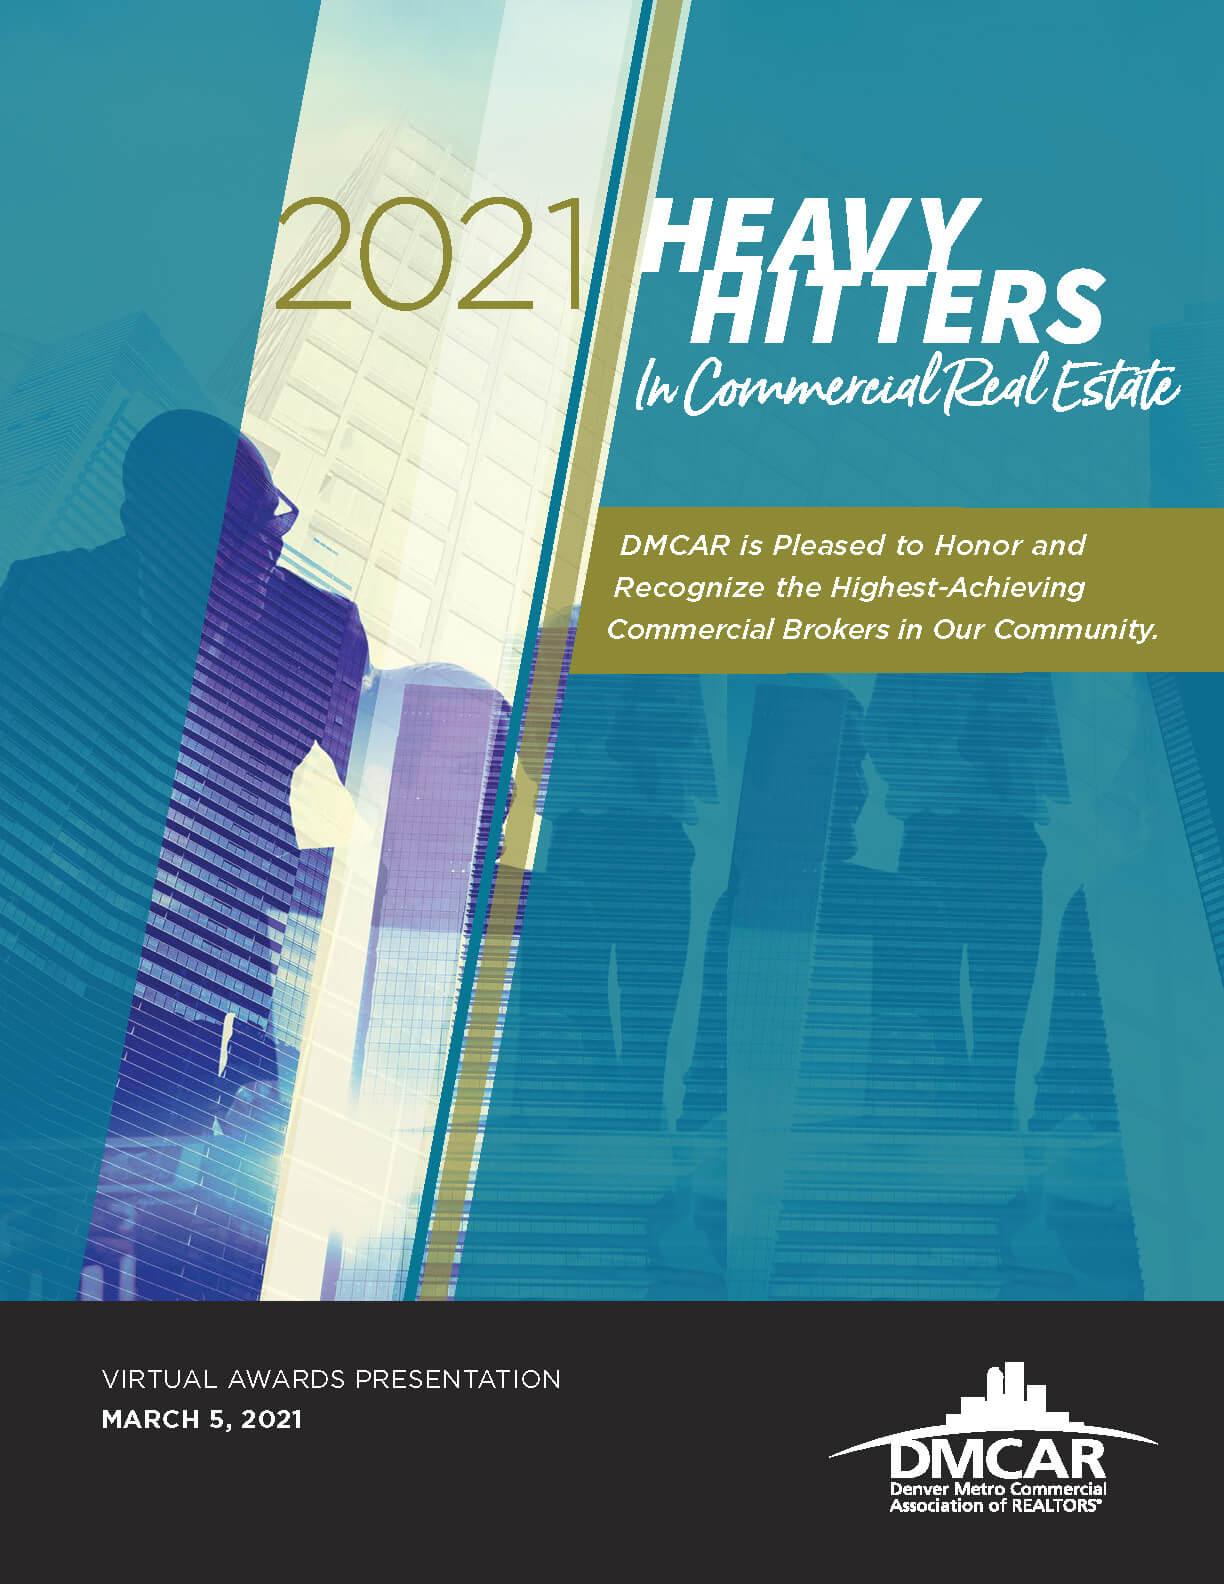 2021 Heavy Hitters